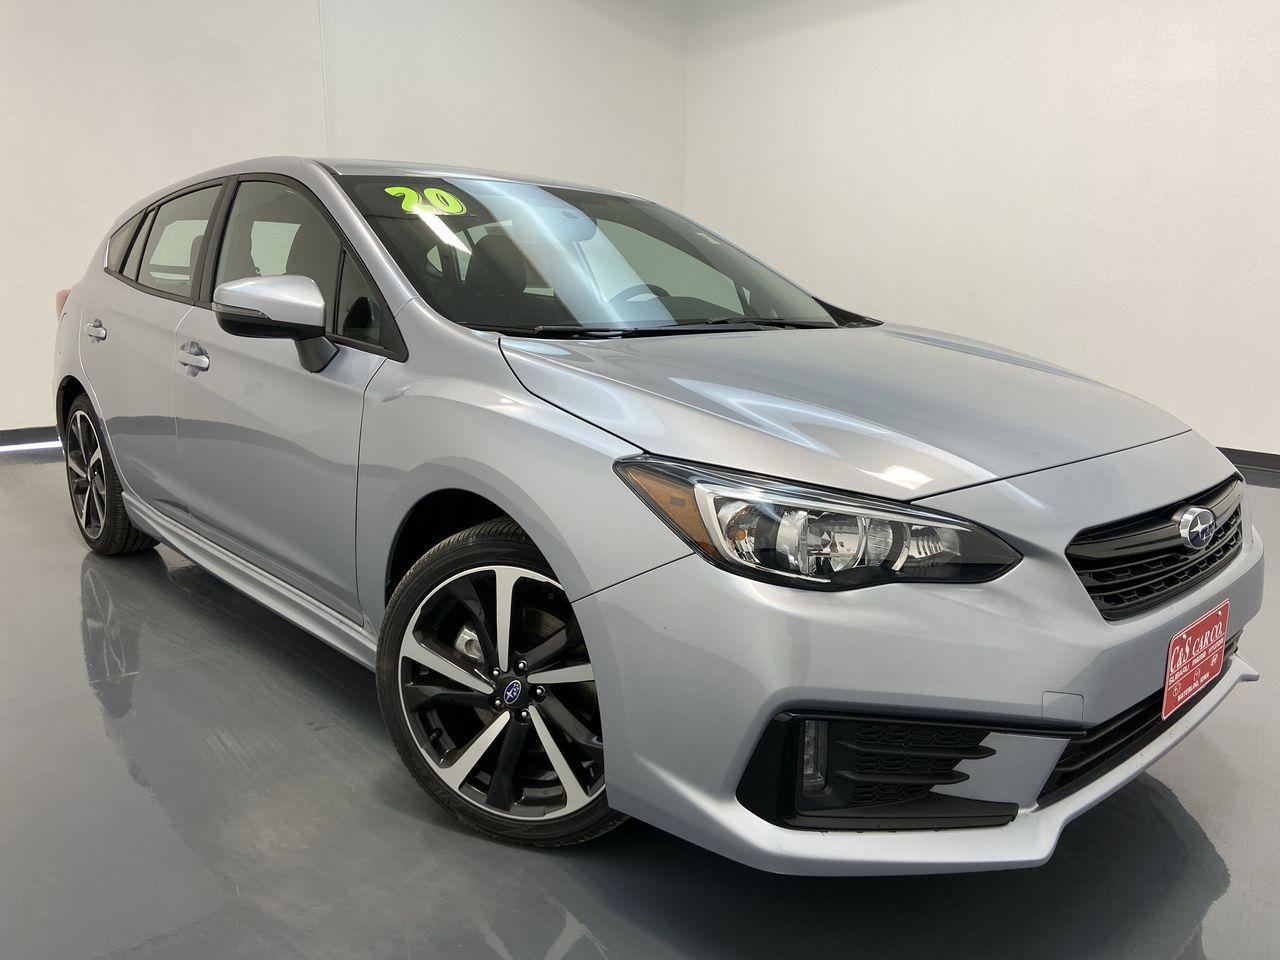 2020 Subaru Impreza  - SB8866  - C & S Car Company